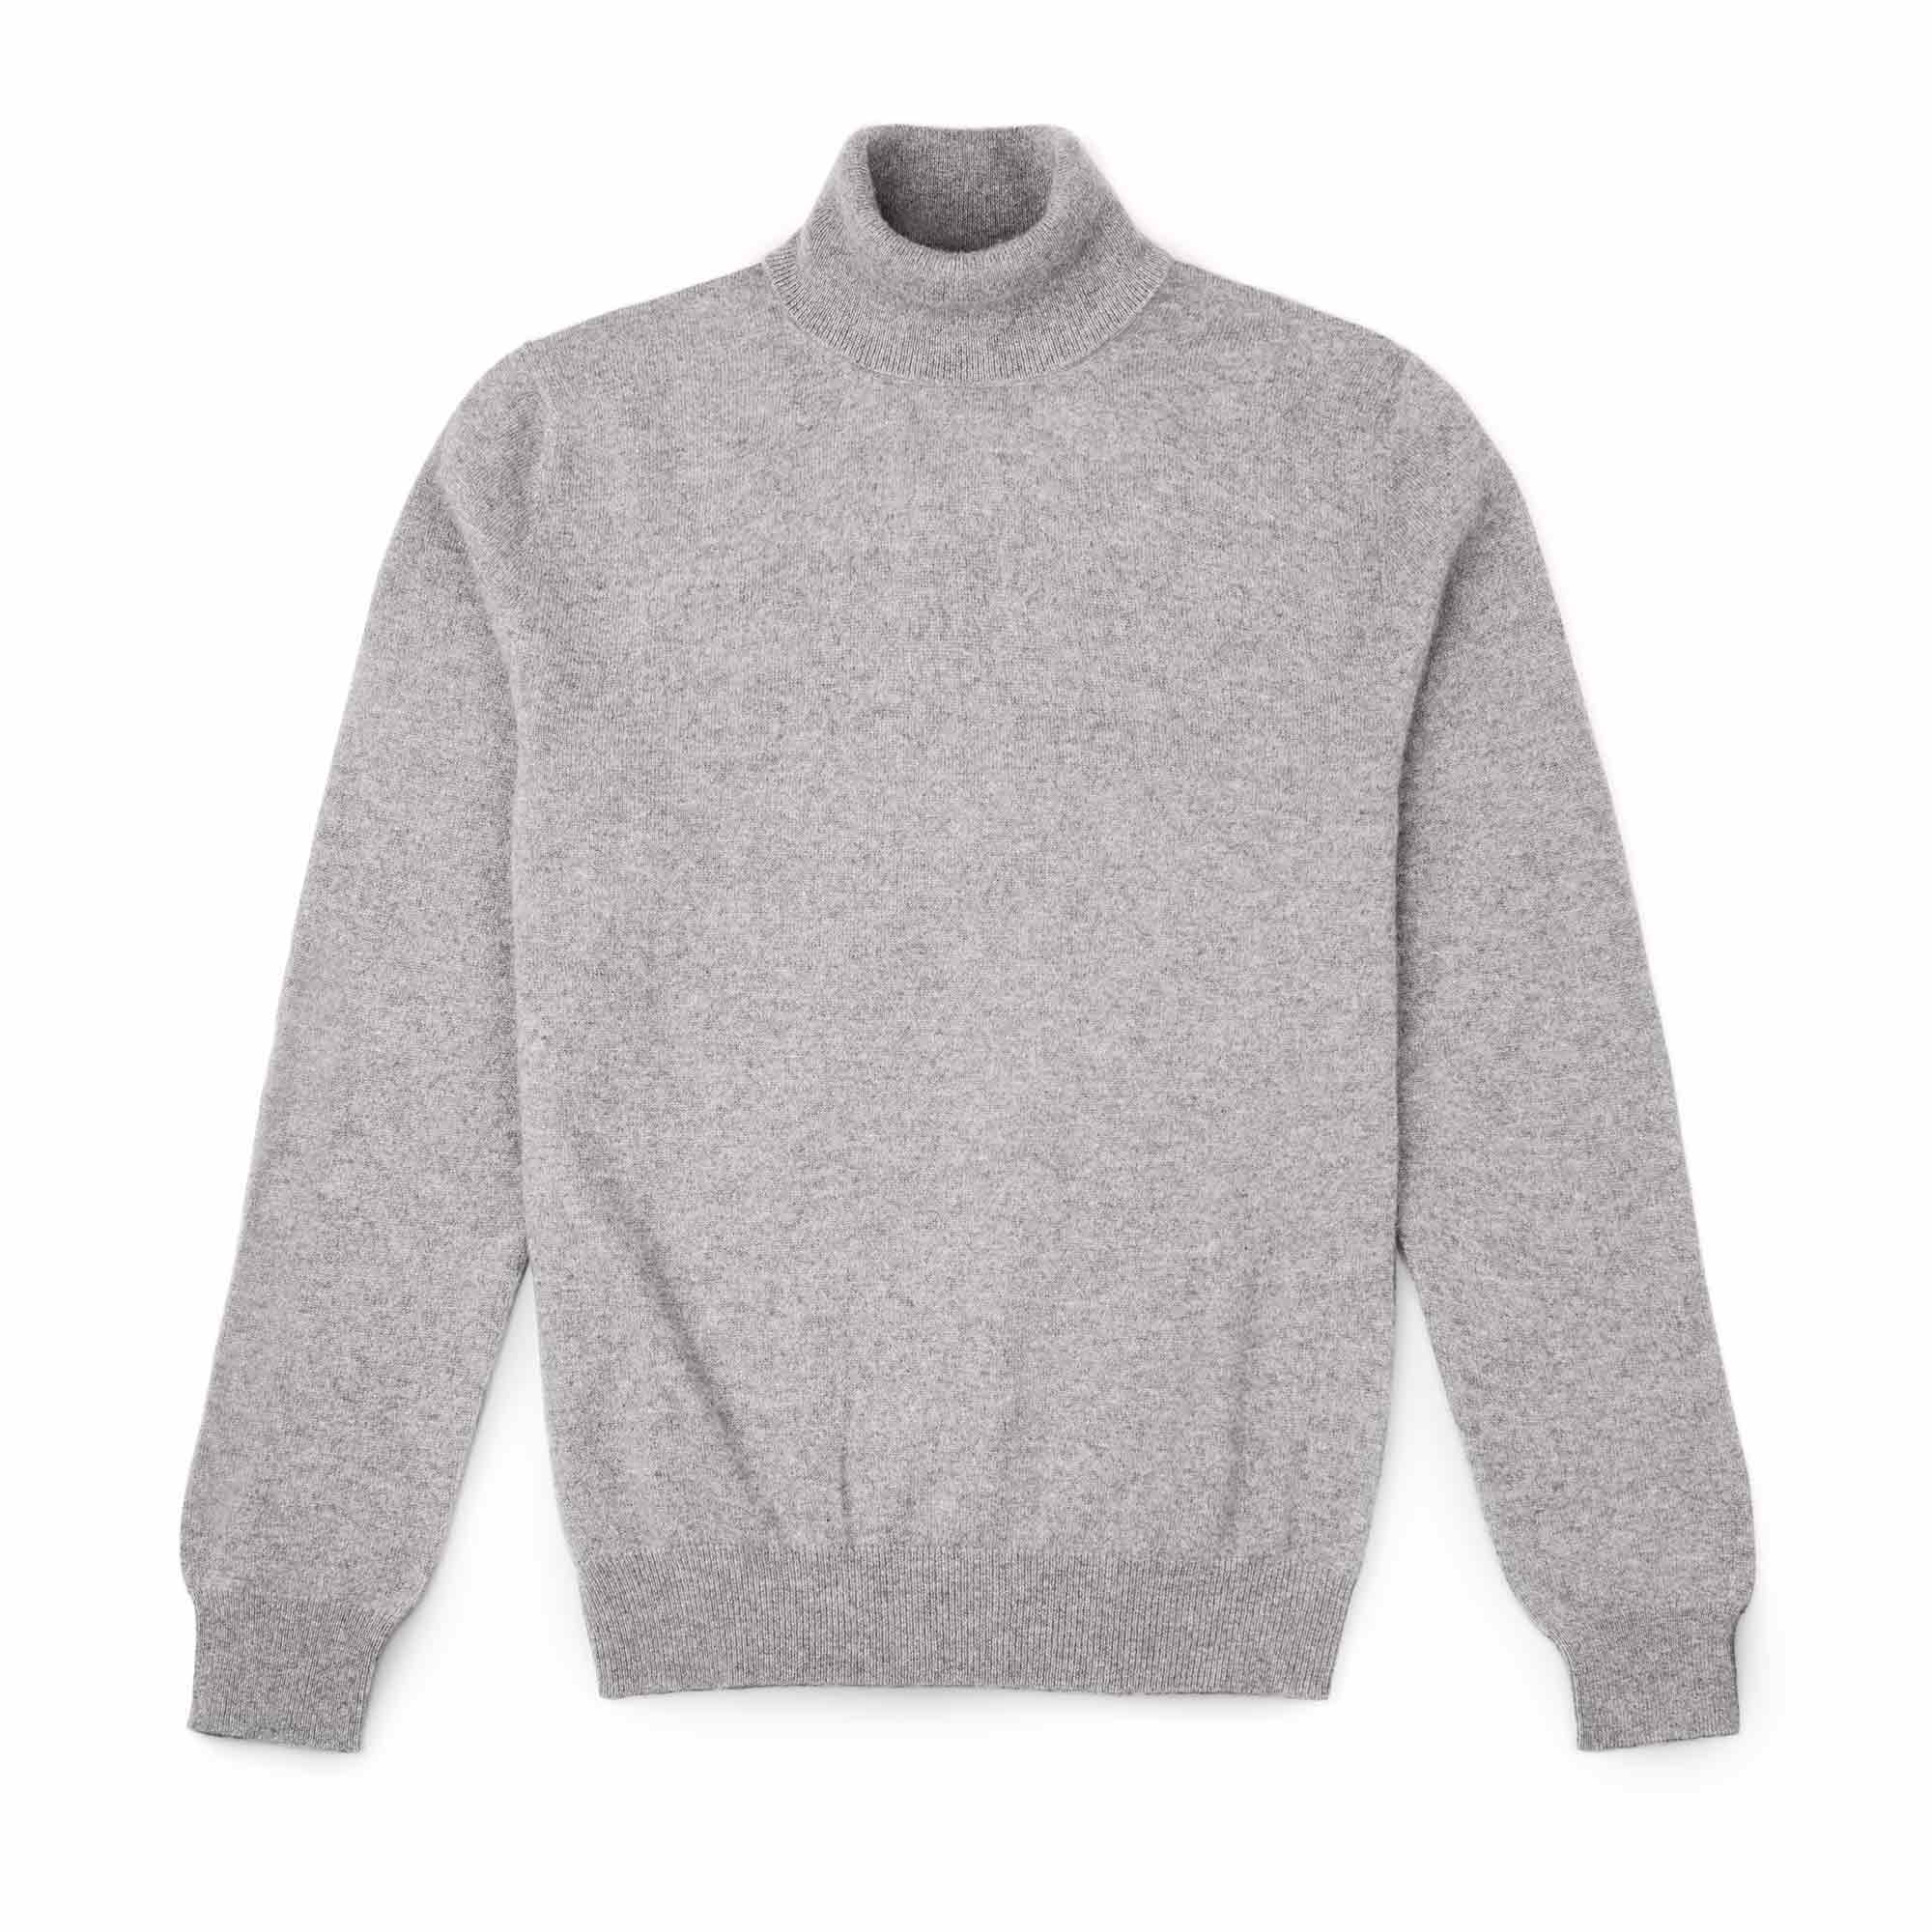 Luca Faloni Dolomiti Grey Pure Cashmere Roll Neck Made in Italy